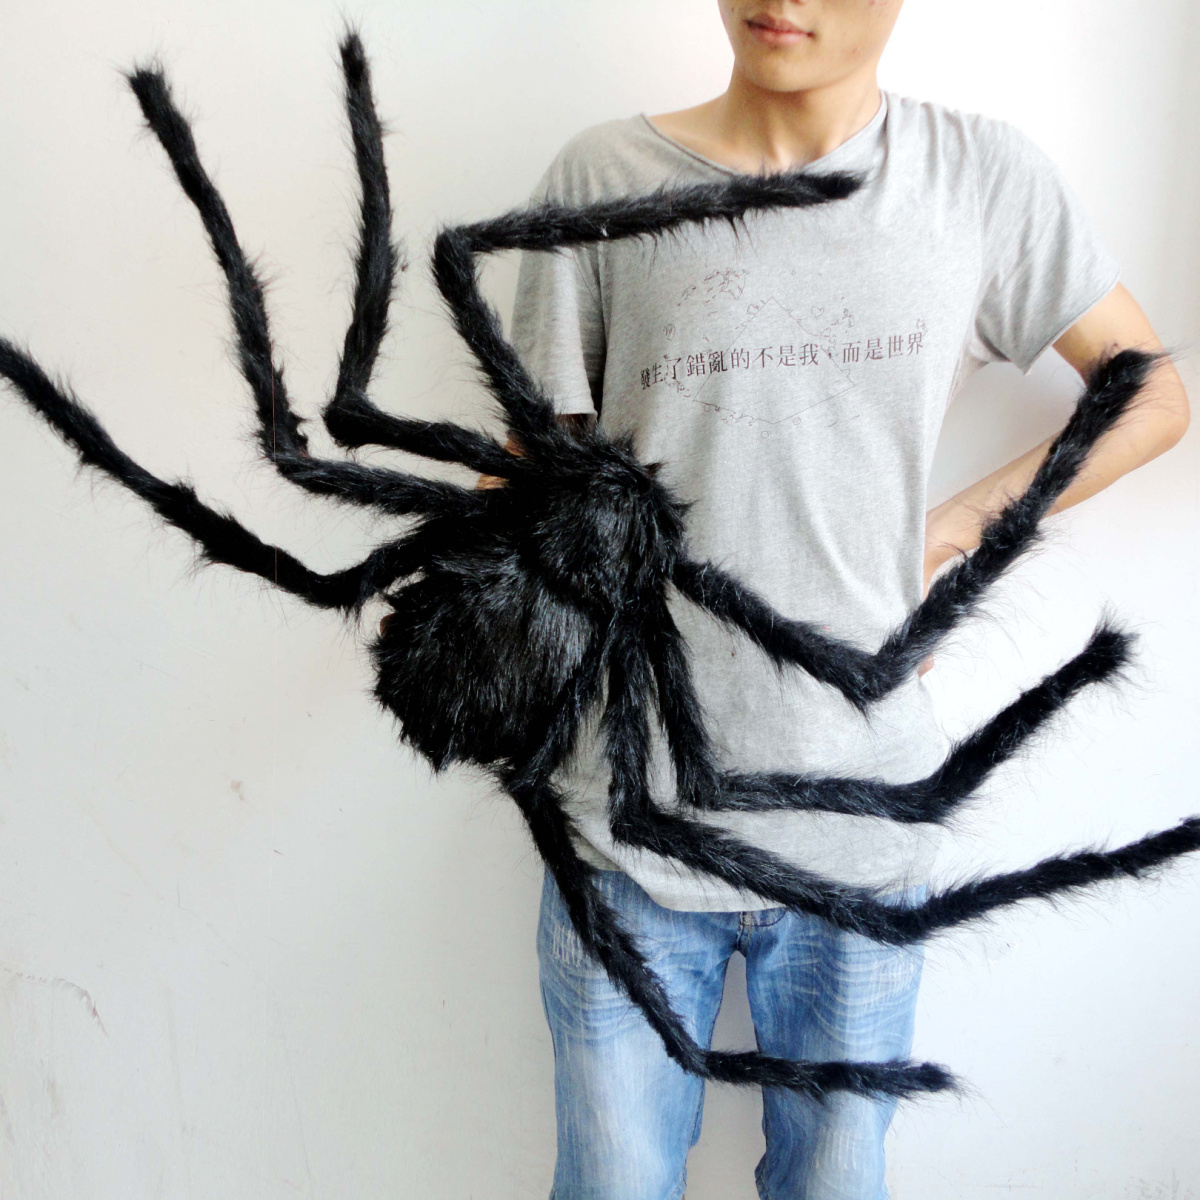 grosse-araignee